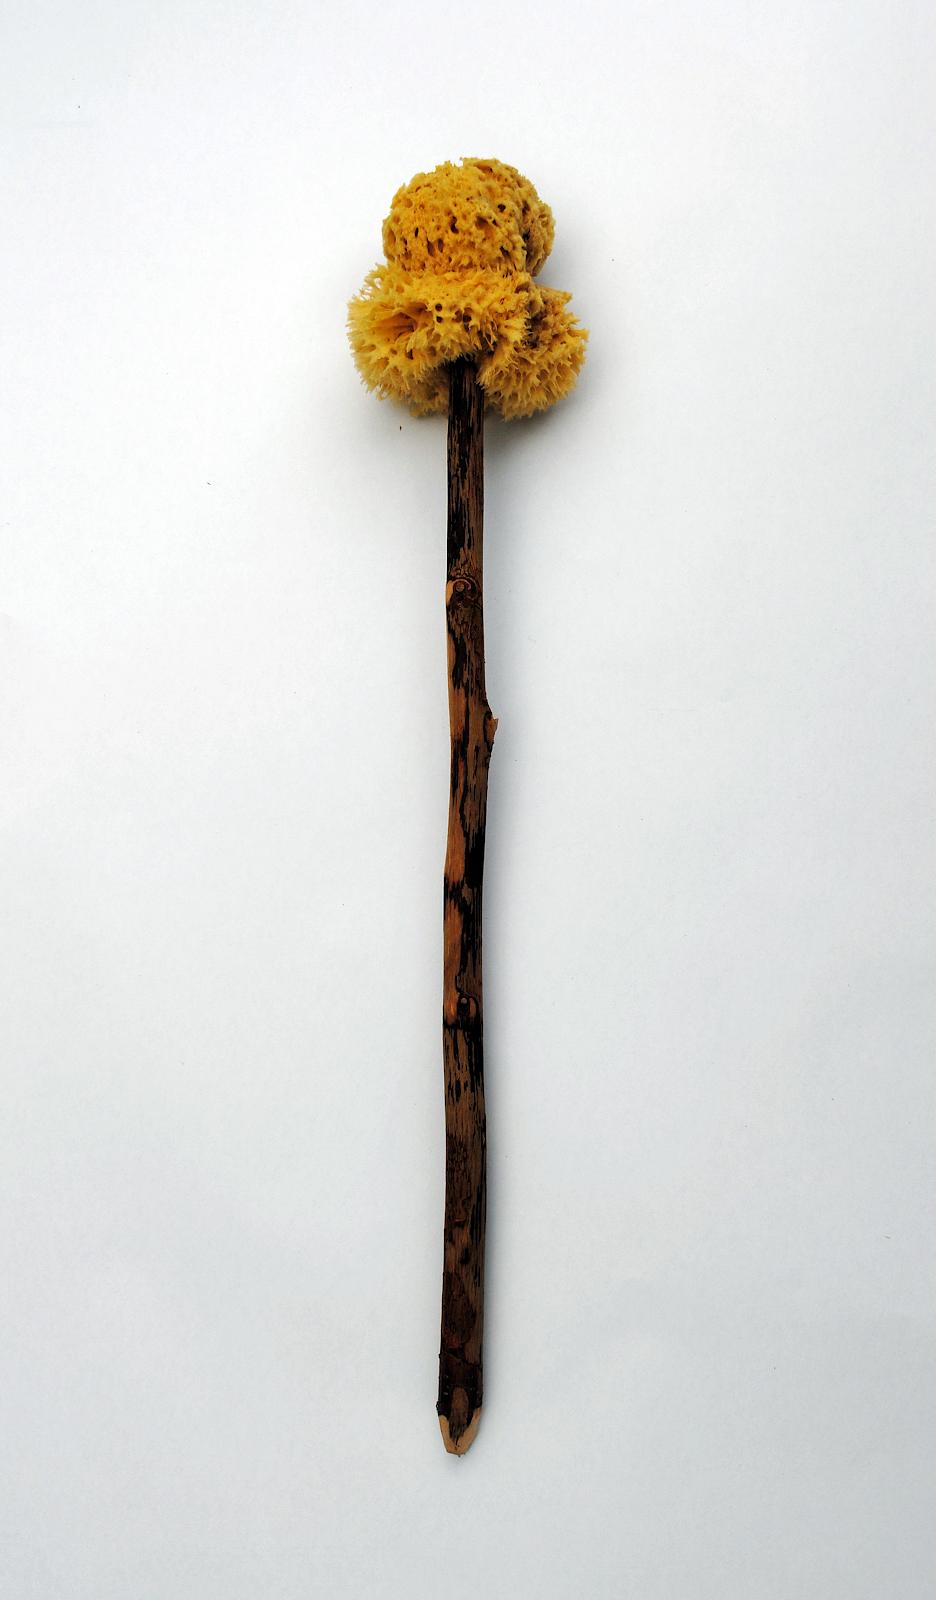 D. Herdemerten.  Xylospongium .  November 2012. Sponge on a stick.